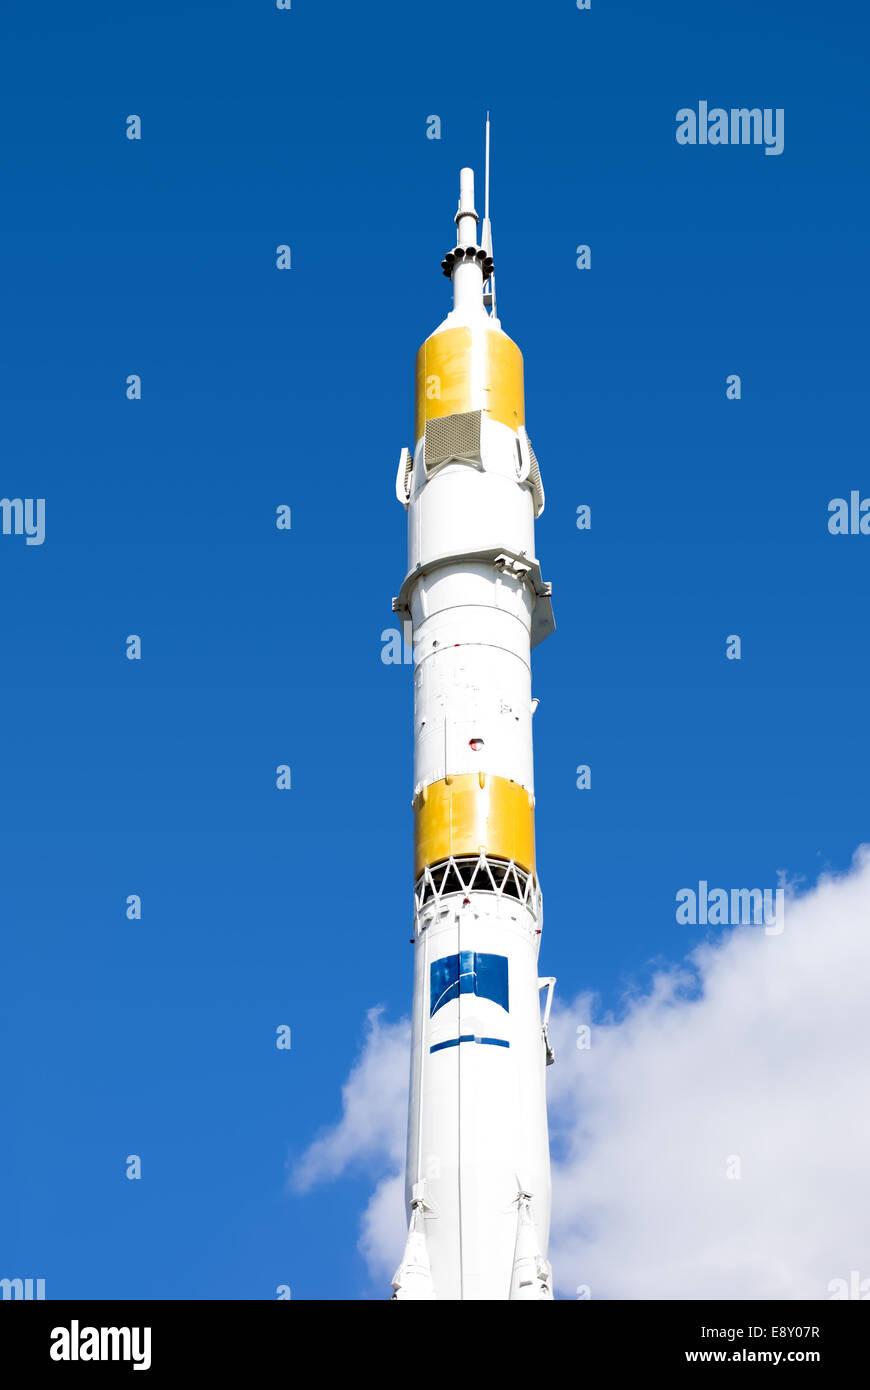 spaceship - Stock Image